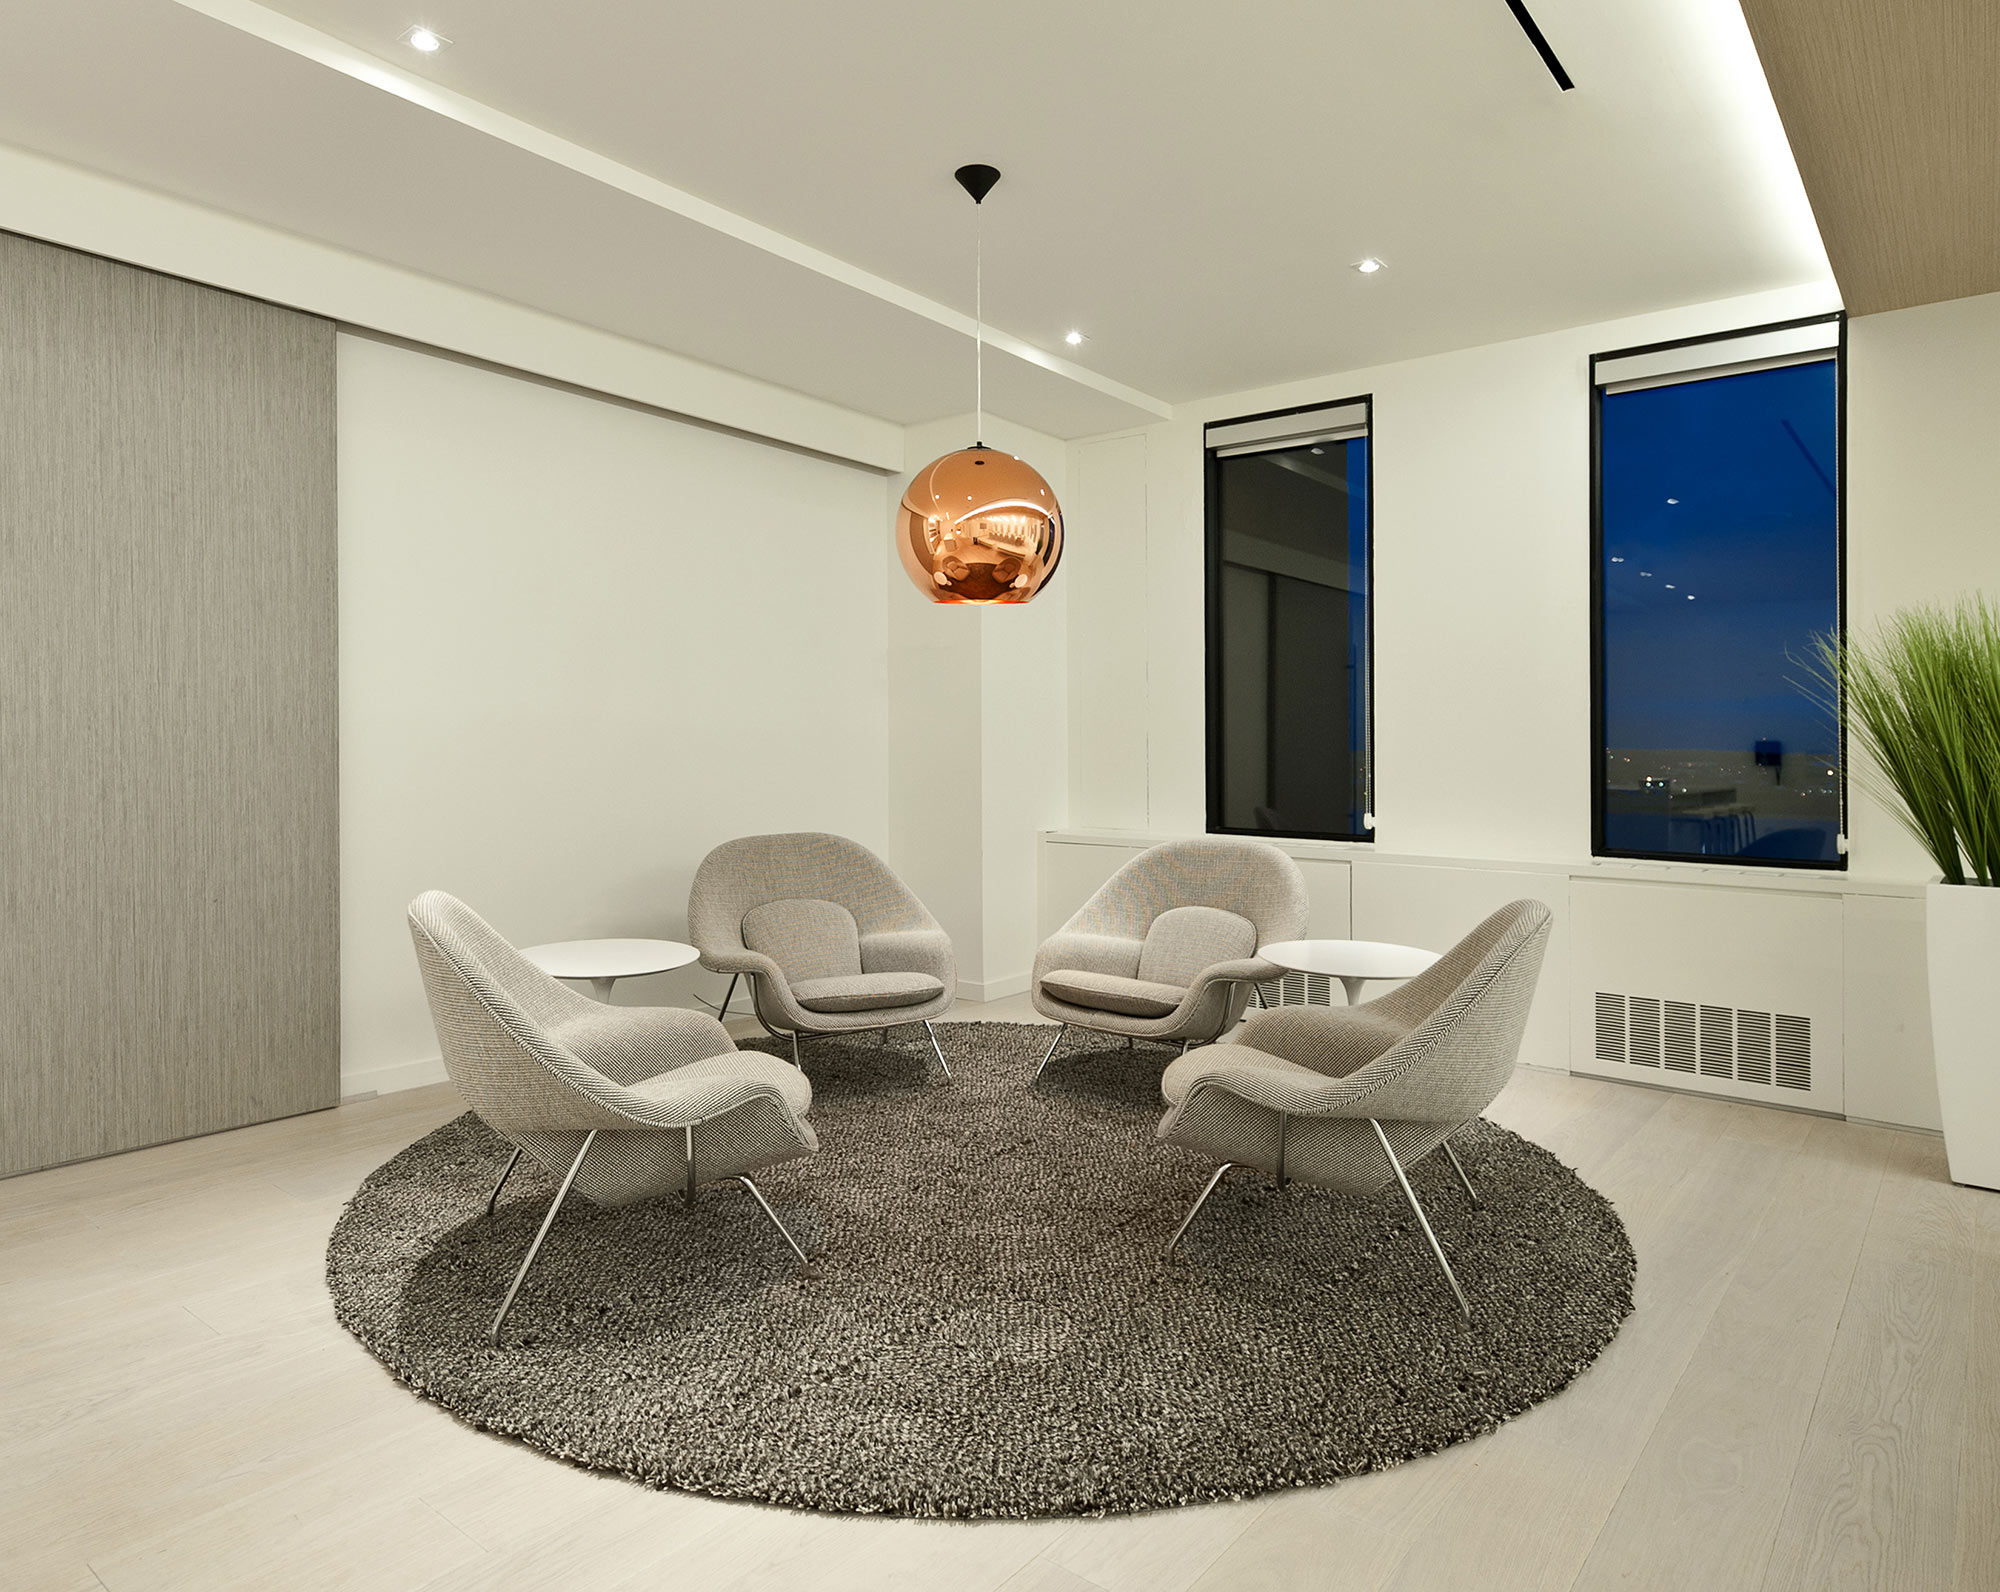 interior-design-financial-office-seating.jpg